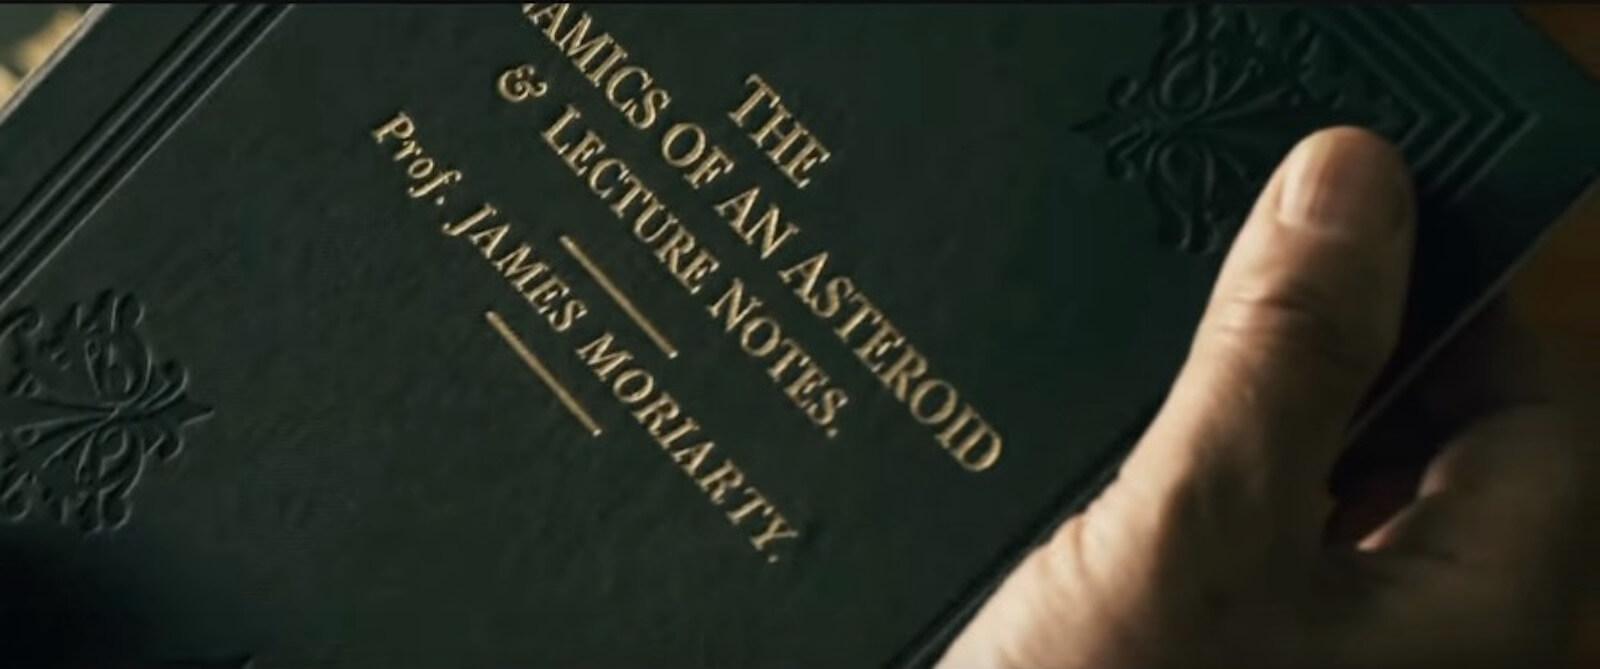 Extreme Close Ups ECU Sherlock Holmes Book